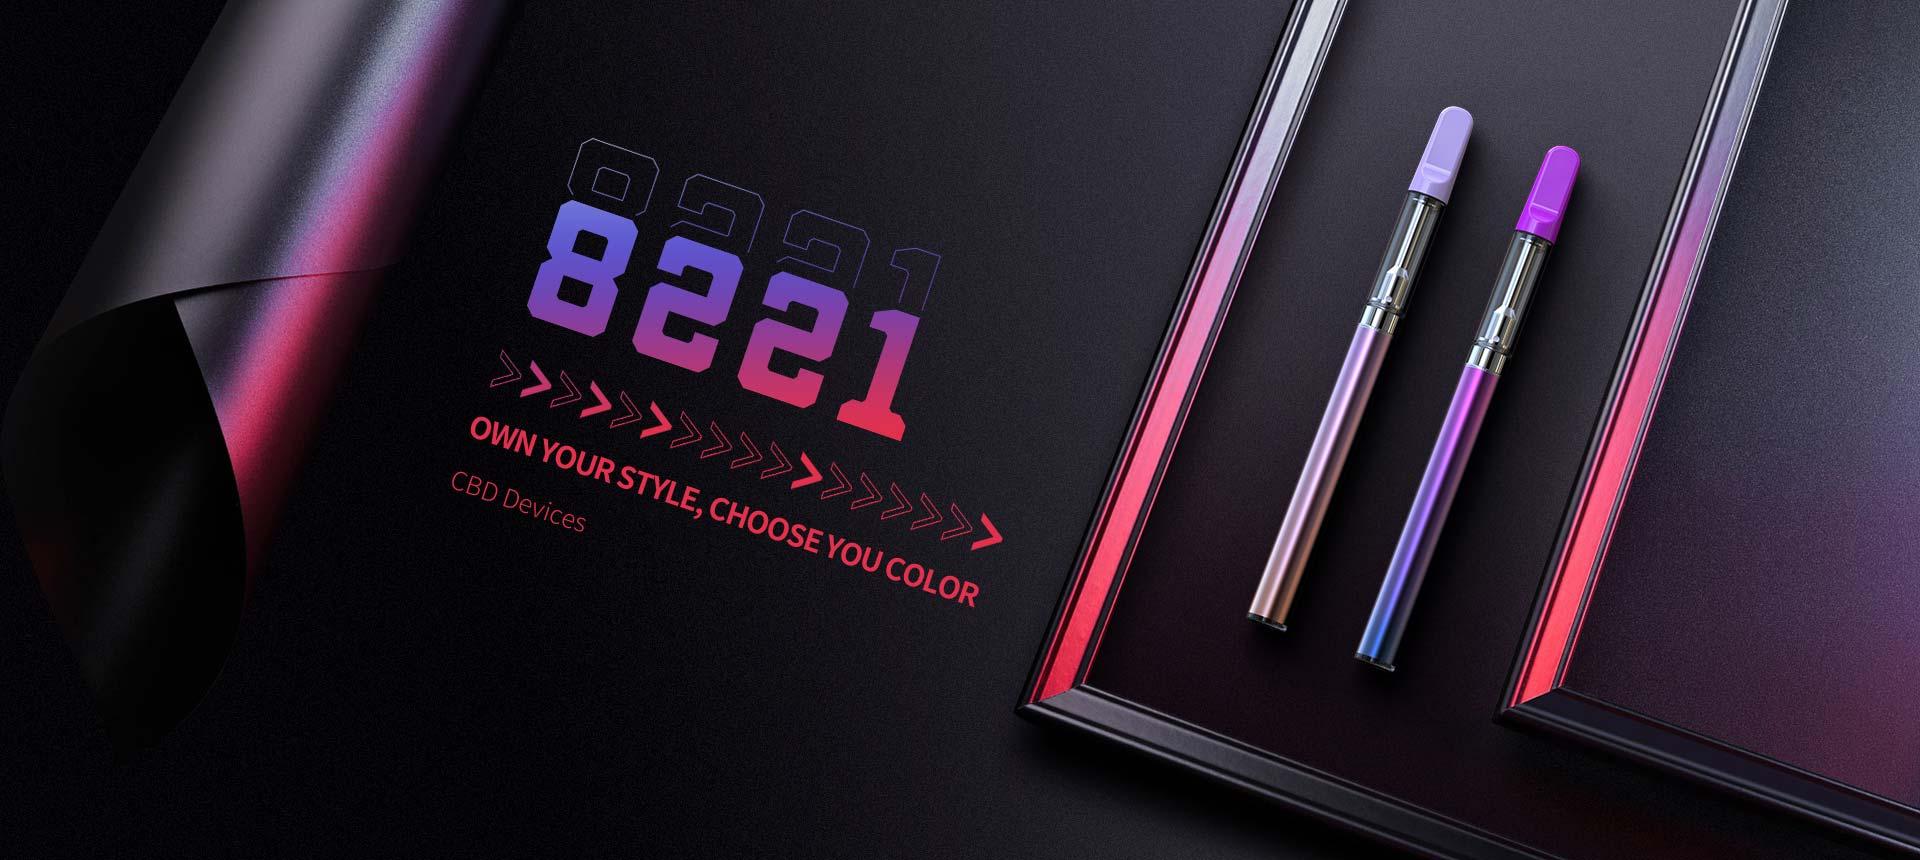 cbd battery 8221 01